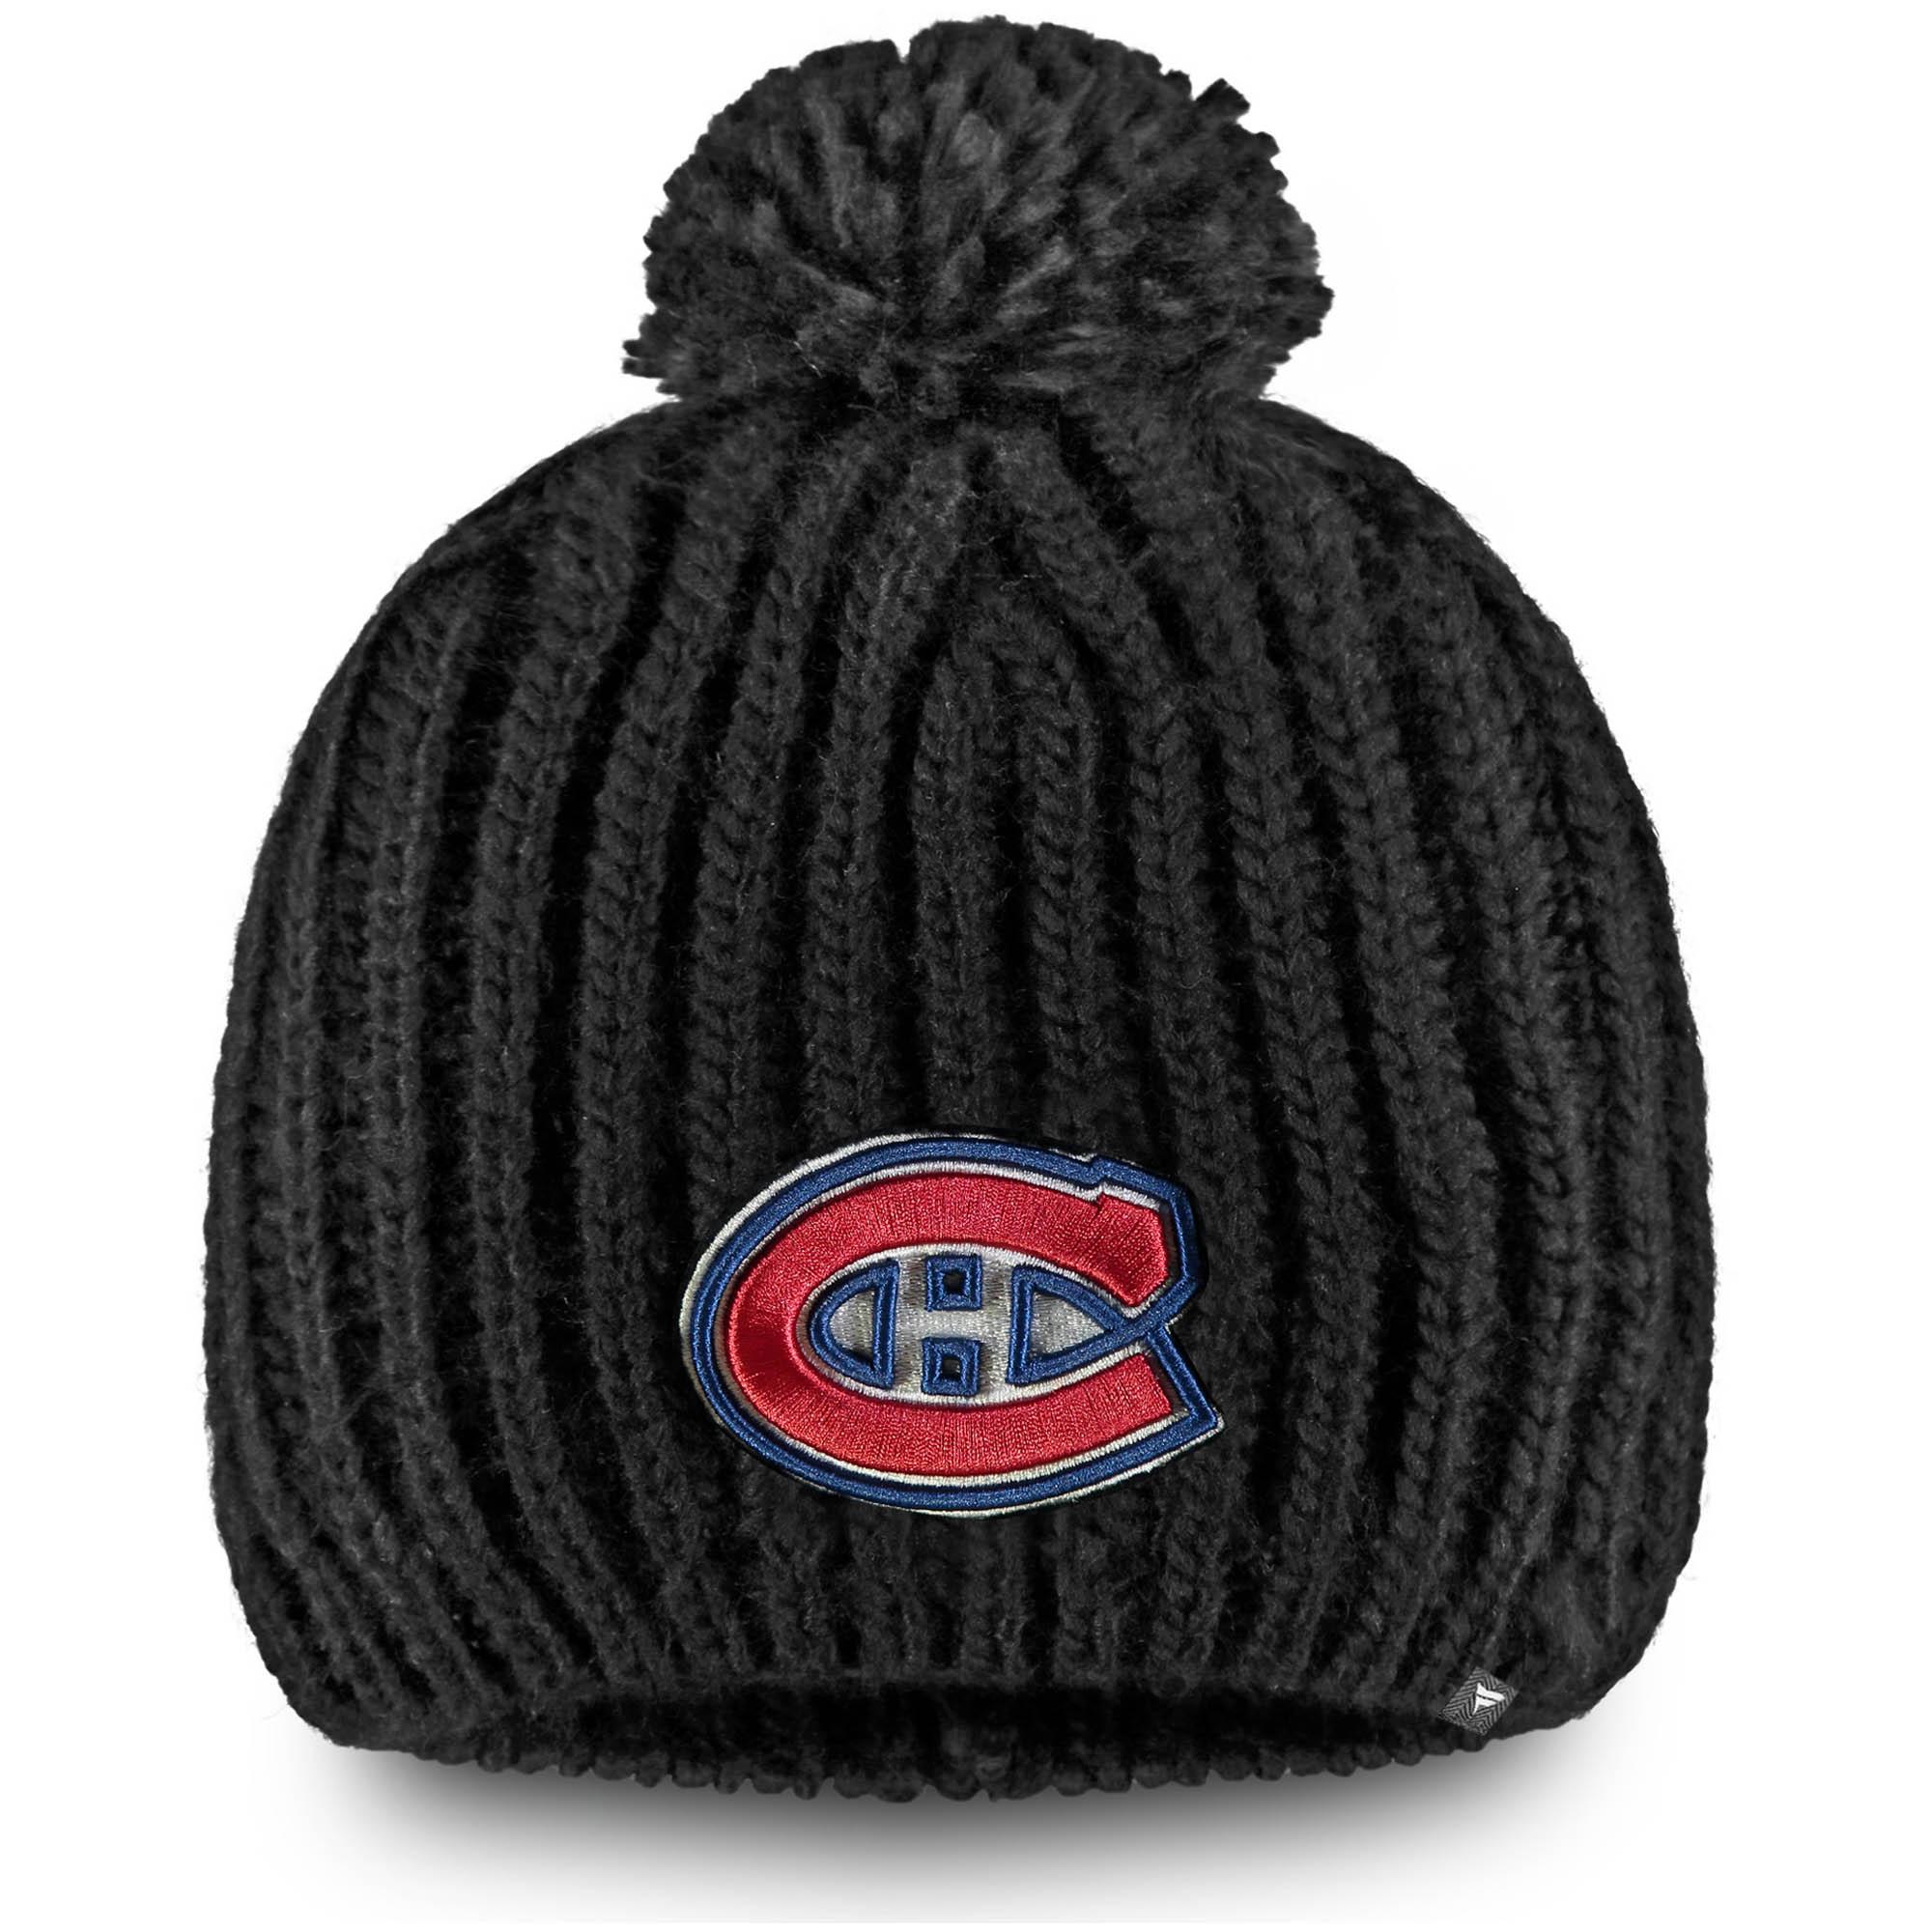 Montreal Canadiens Fanatics Branded Women's Iconic Knit Beanie with Pom - Black - OSFA